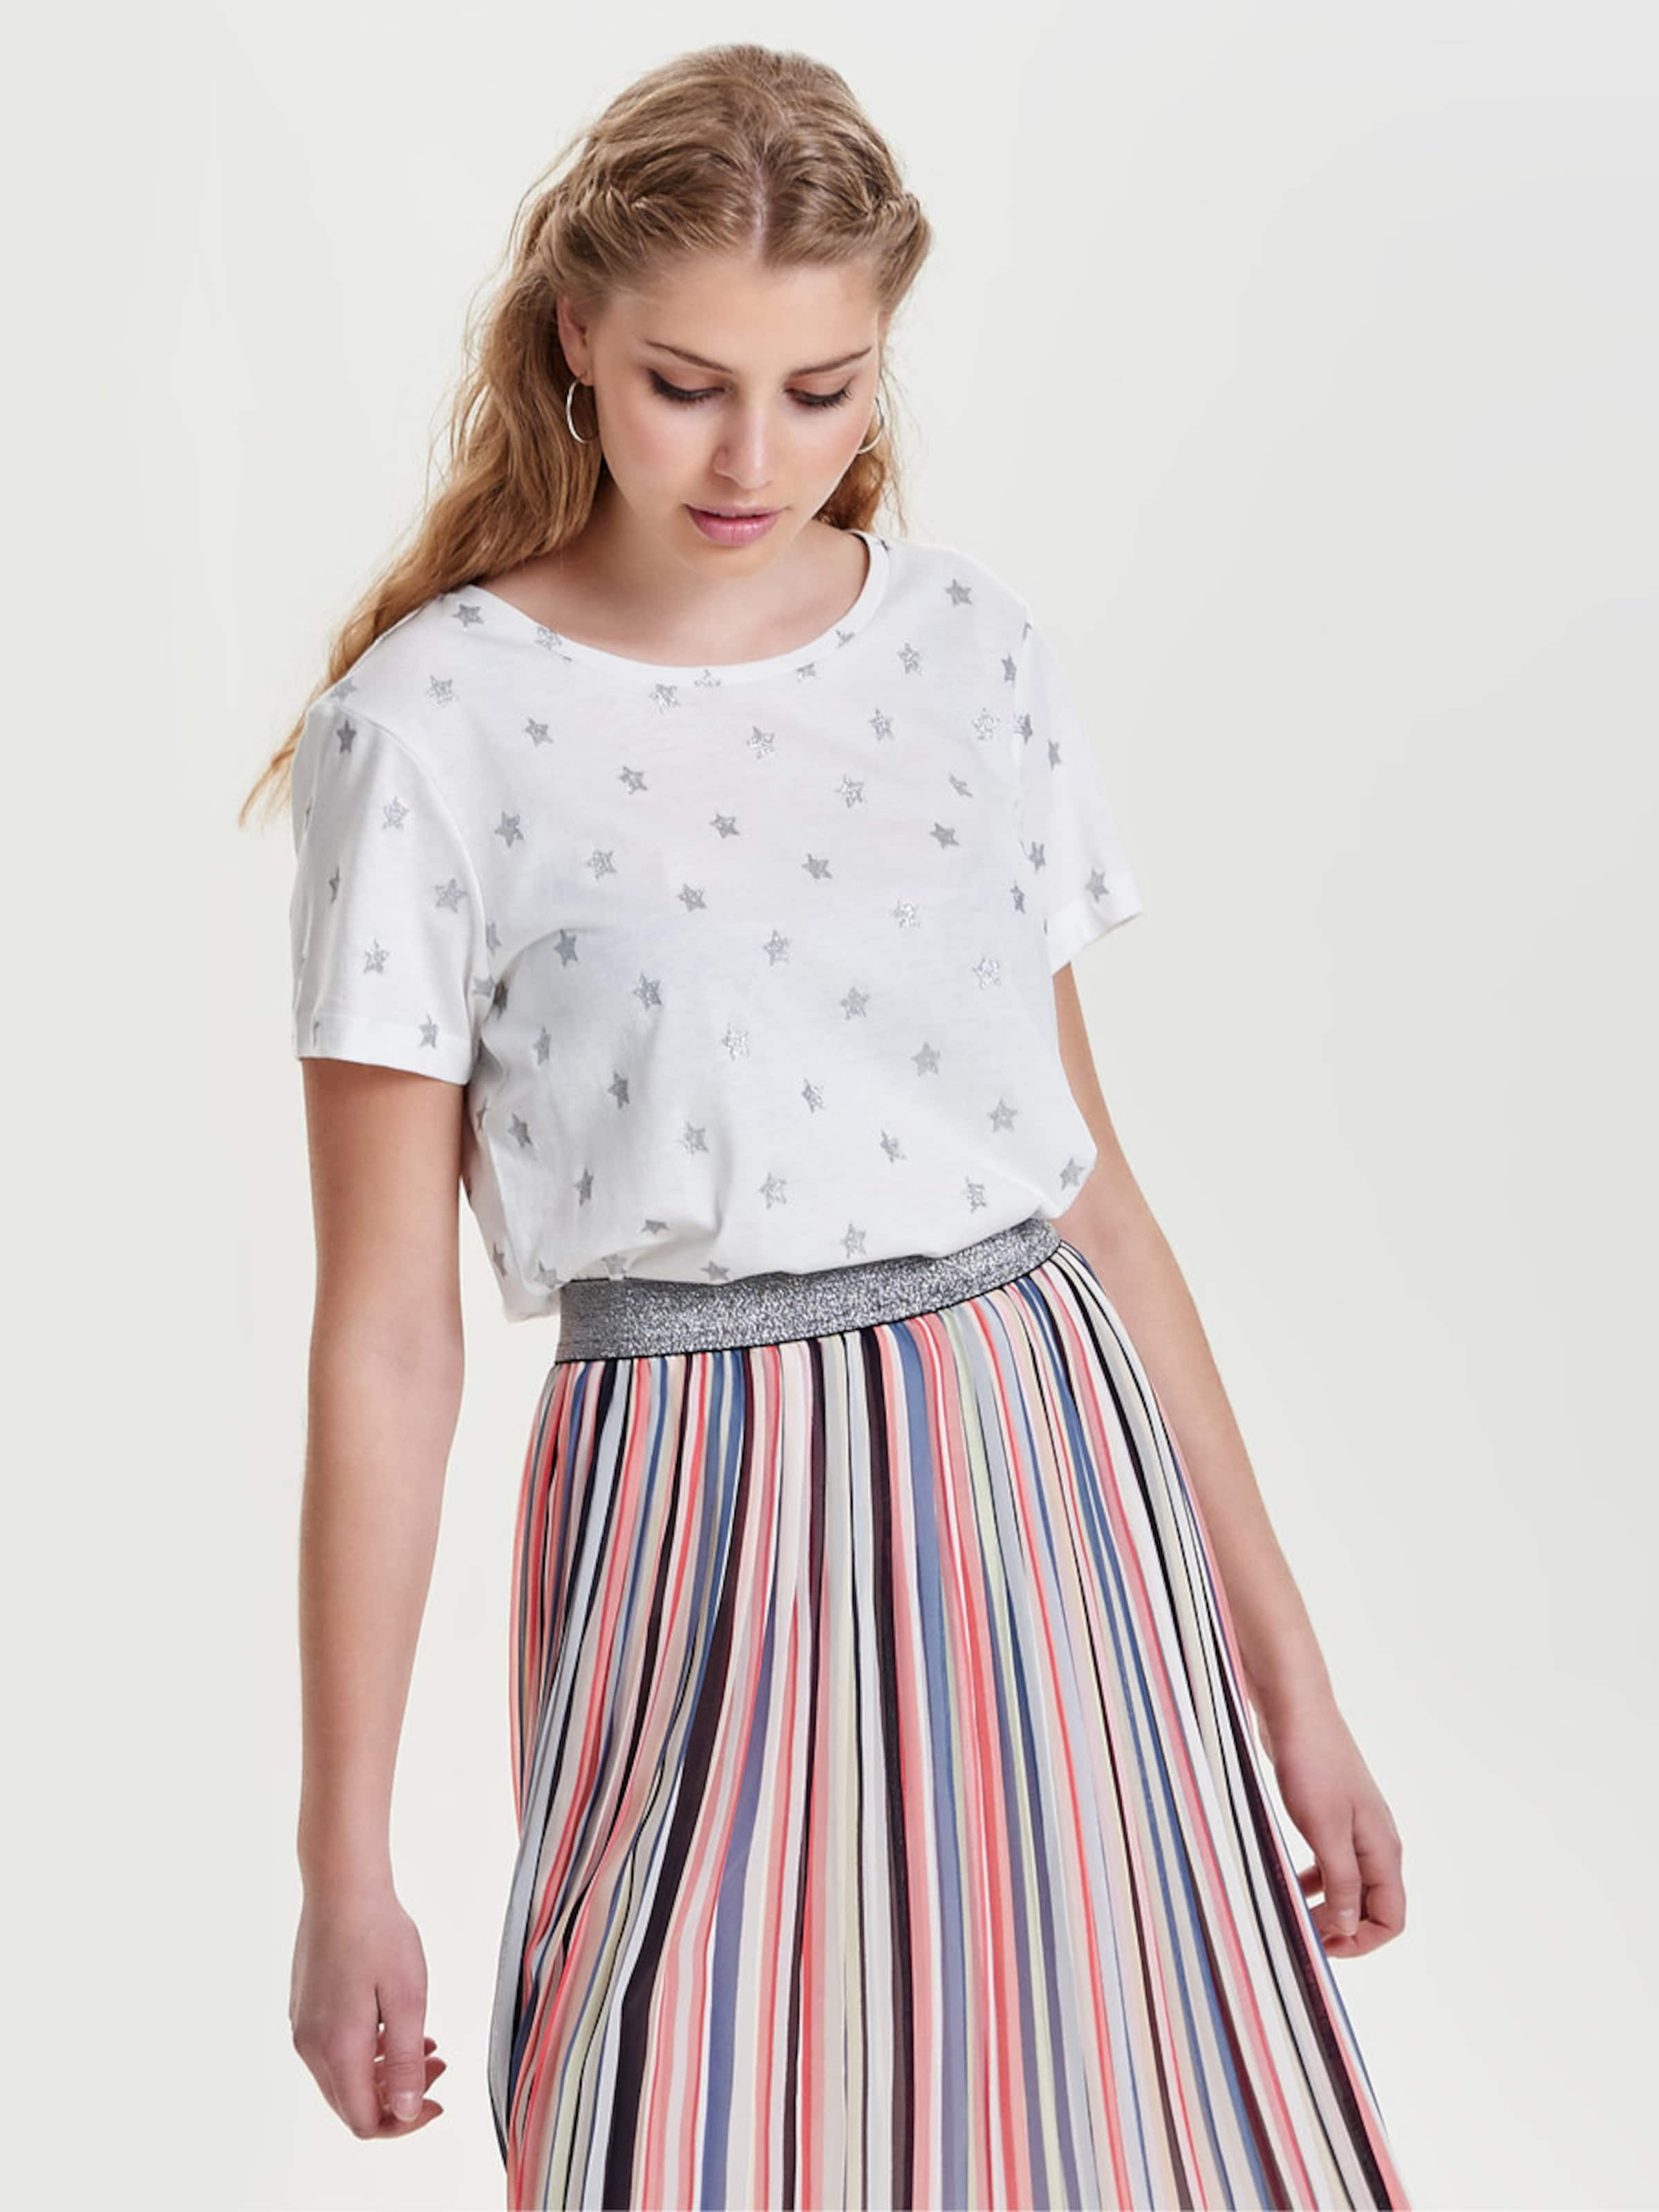 JACQUELINE de YONG Bedrucktes T-Shirt Billig Verkaufen Mode-Stil Günstige Austrittsstellen Rabatt Top-Qualität Vermarktbare Verkauf Online C07cSYBfT